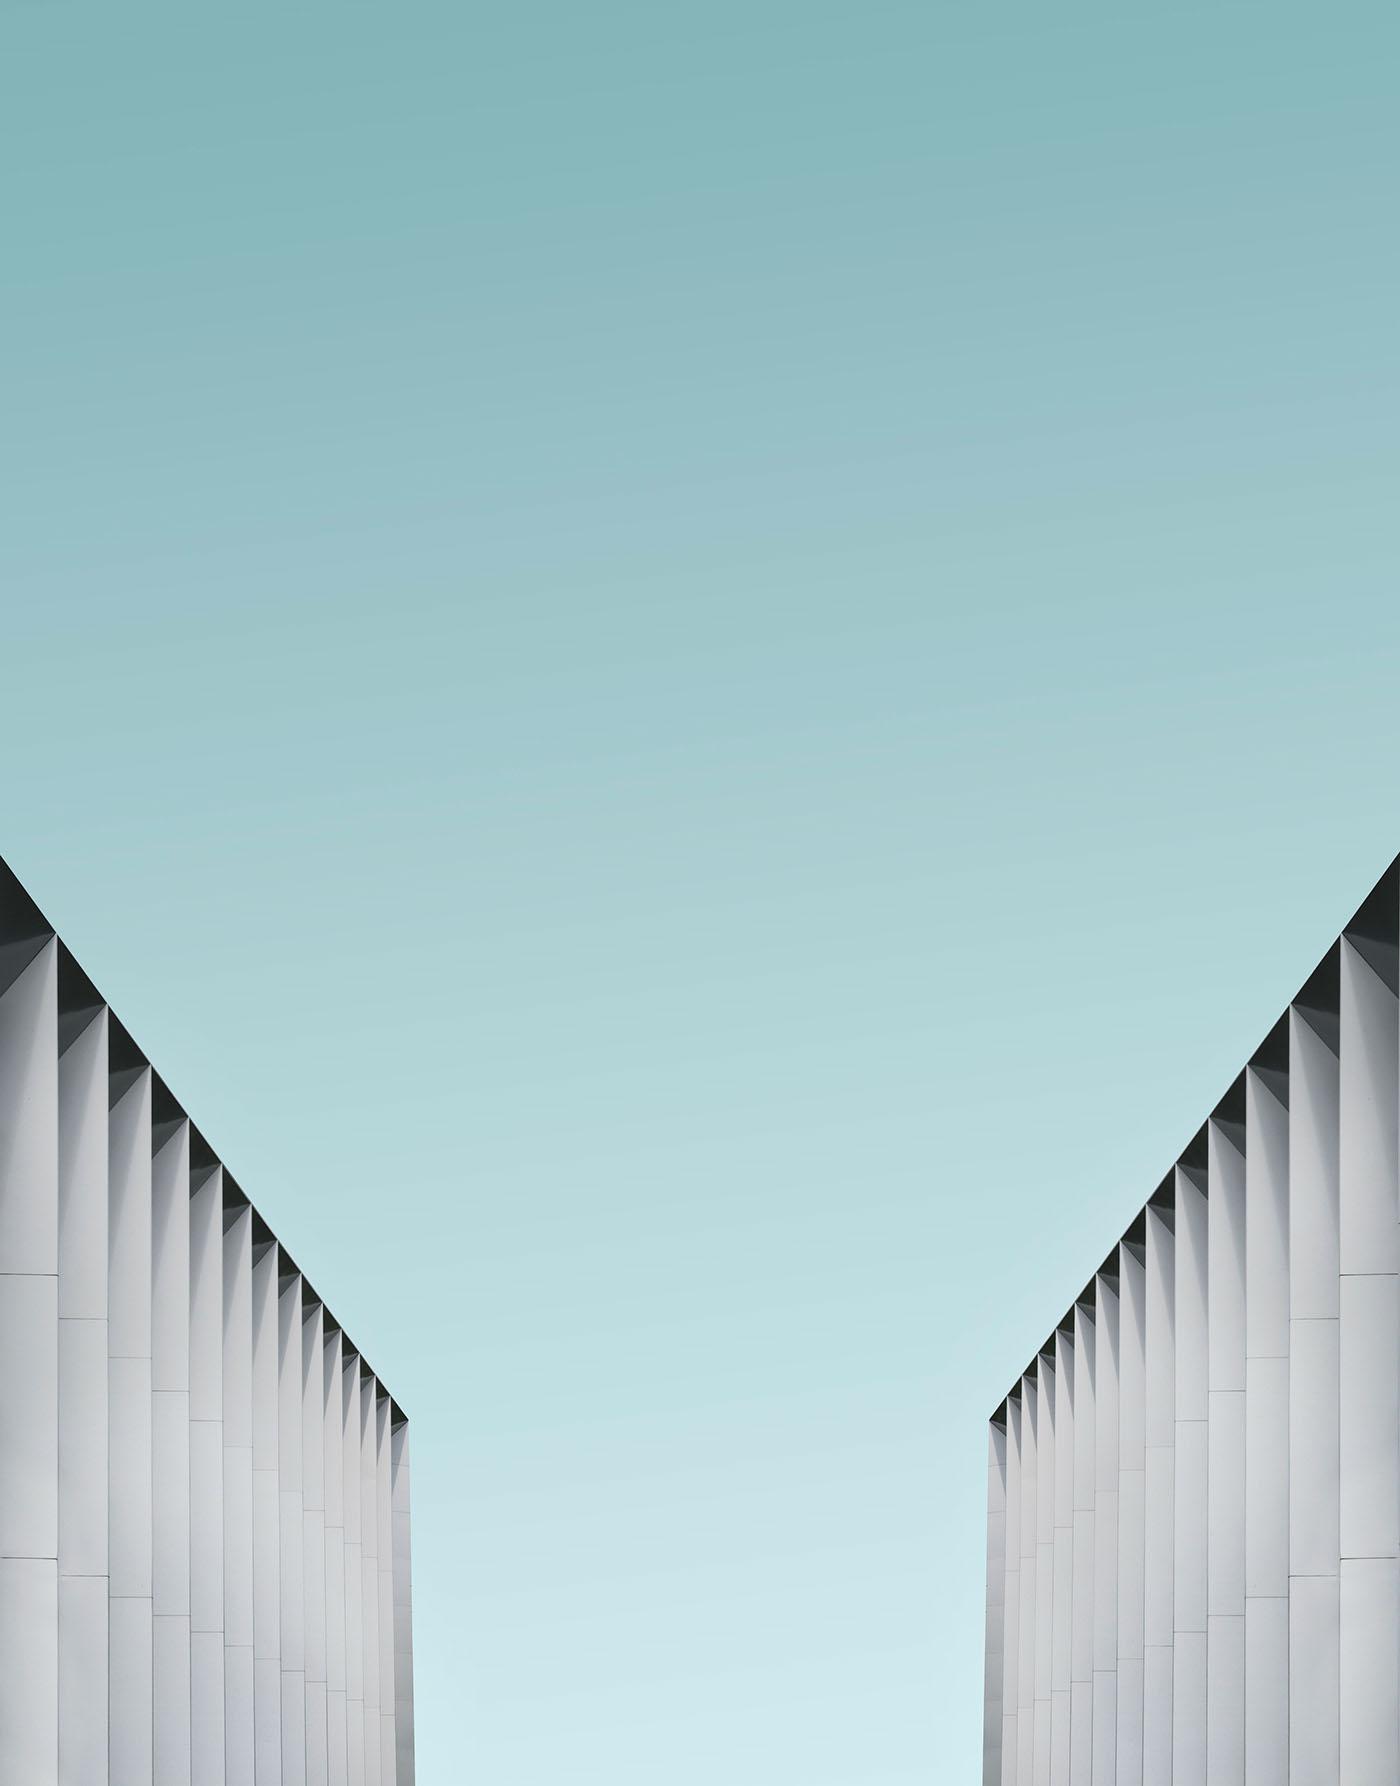 minimal blue geometric SKY building Minimalism geometry Urban architecture London